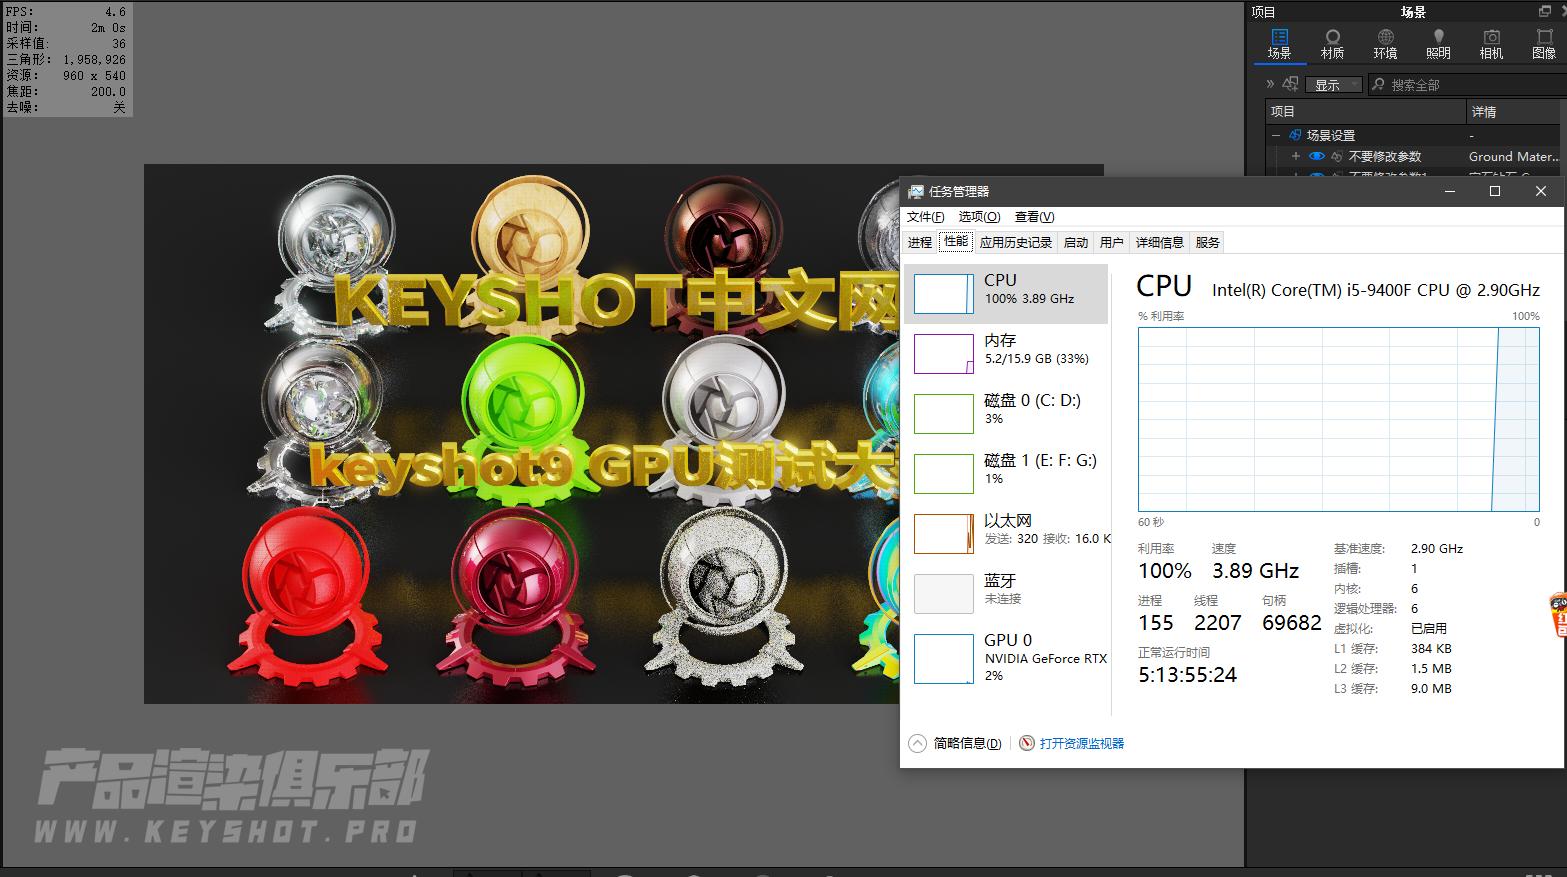 keyshot9—I5 9400F+RTX2060 6G 评测